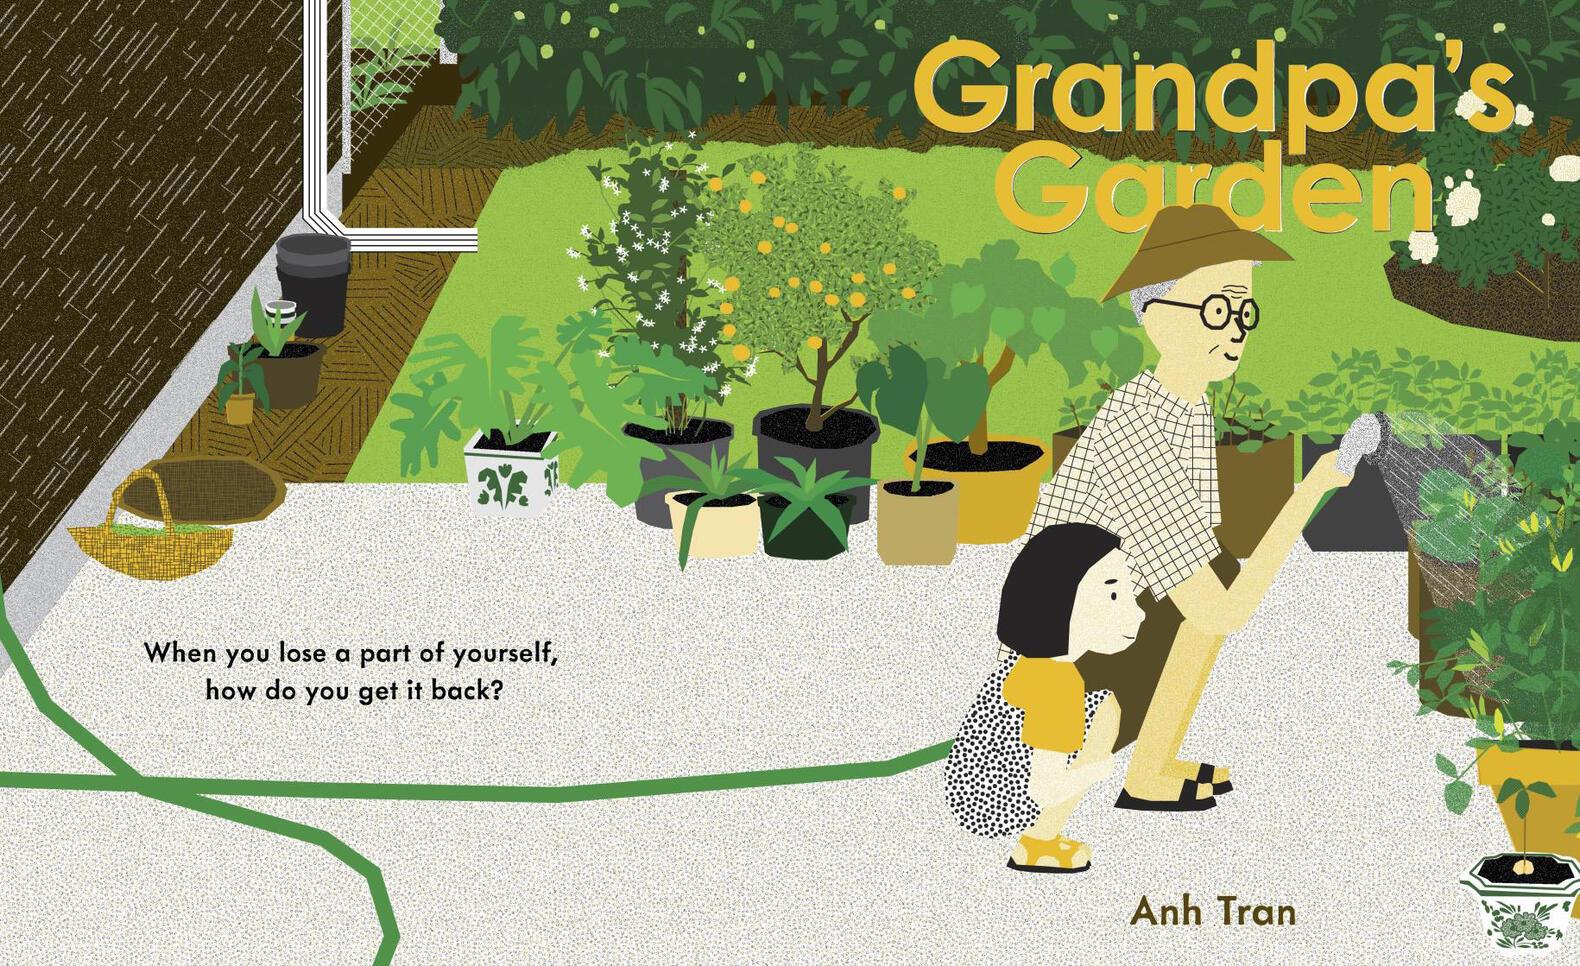 Grandpa's Garden by Anh Tran ; Anh Tran